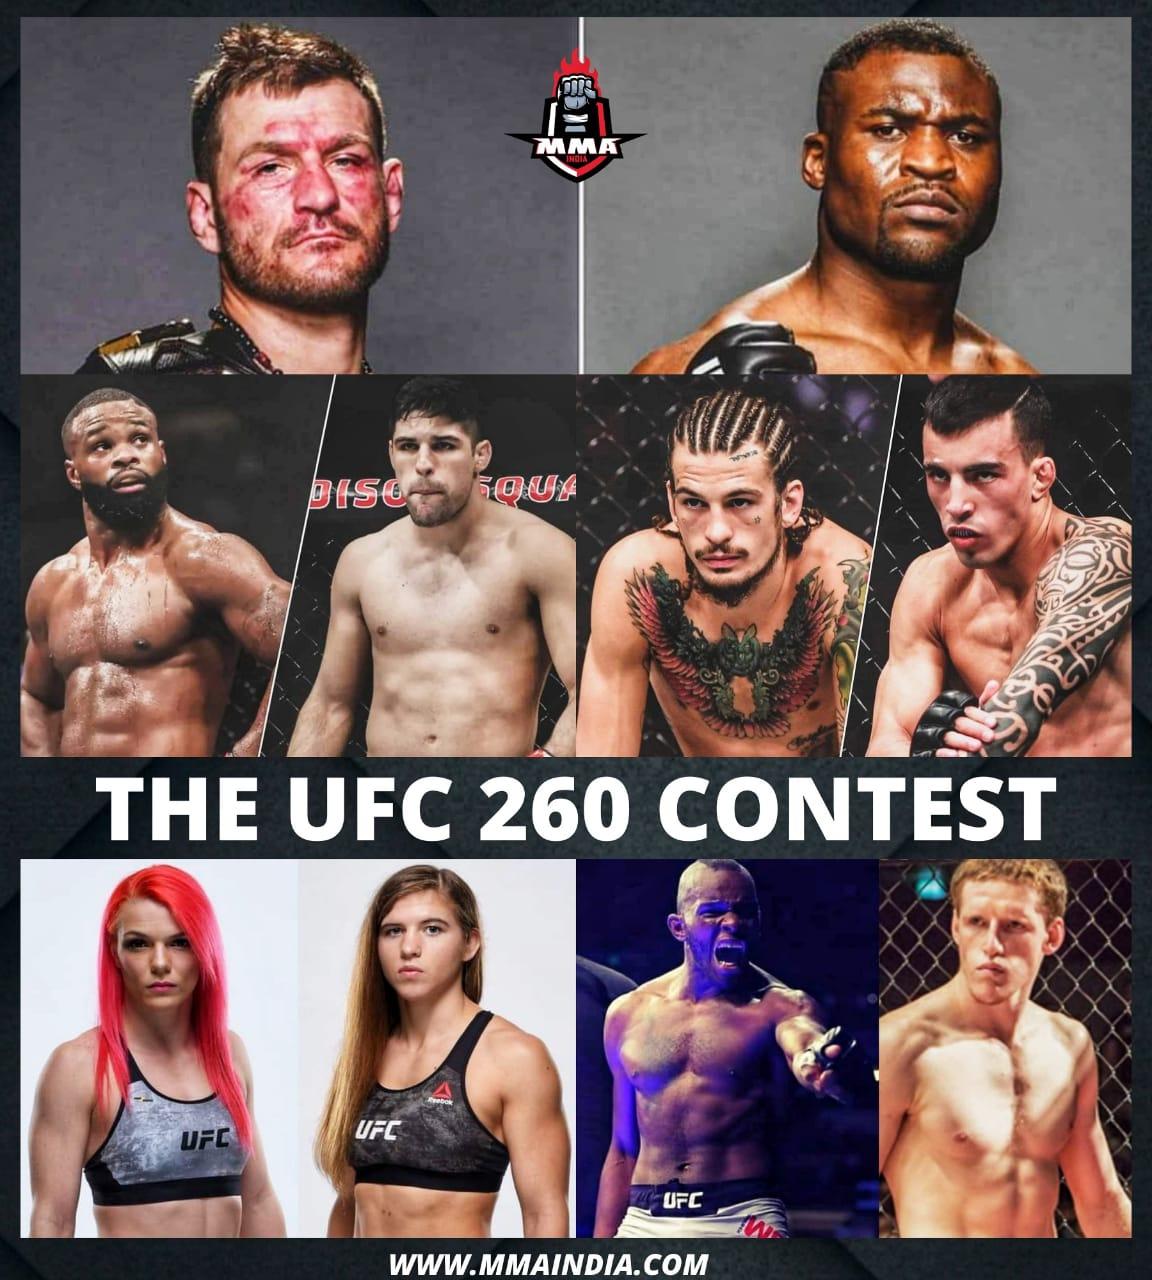 THE UFC 260 CONTEST | MMA INDIA SHOW - UFC 260